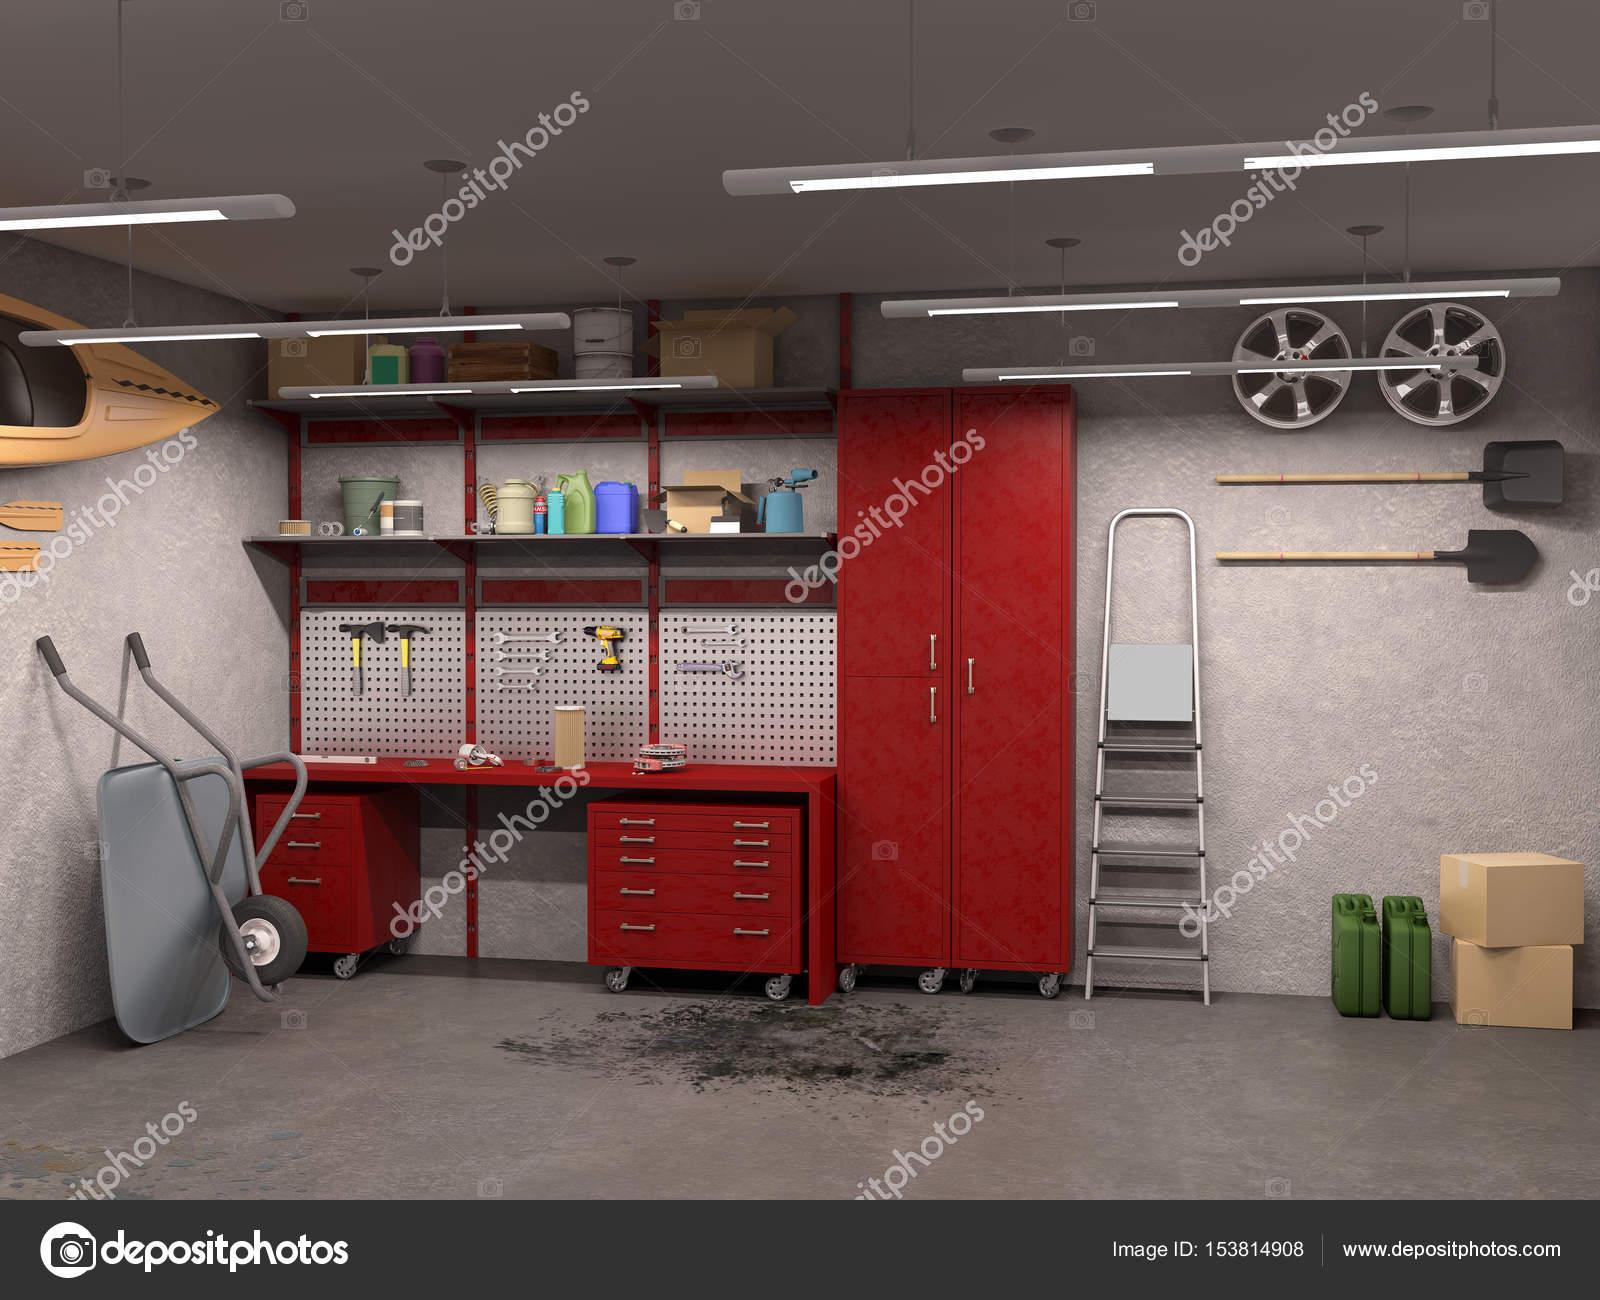 big garage interior with oncrete walls  3d illustration